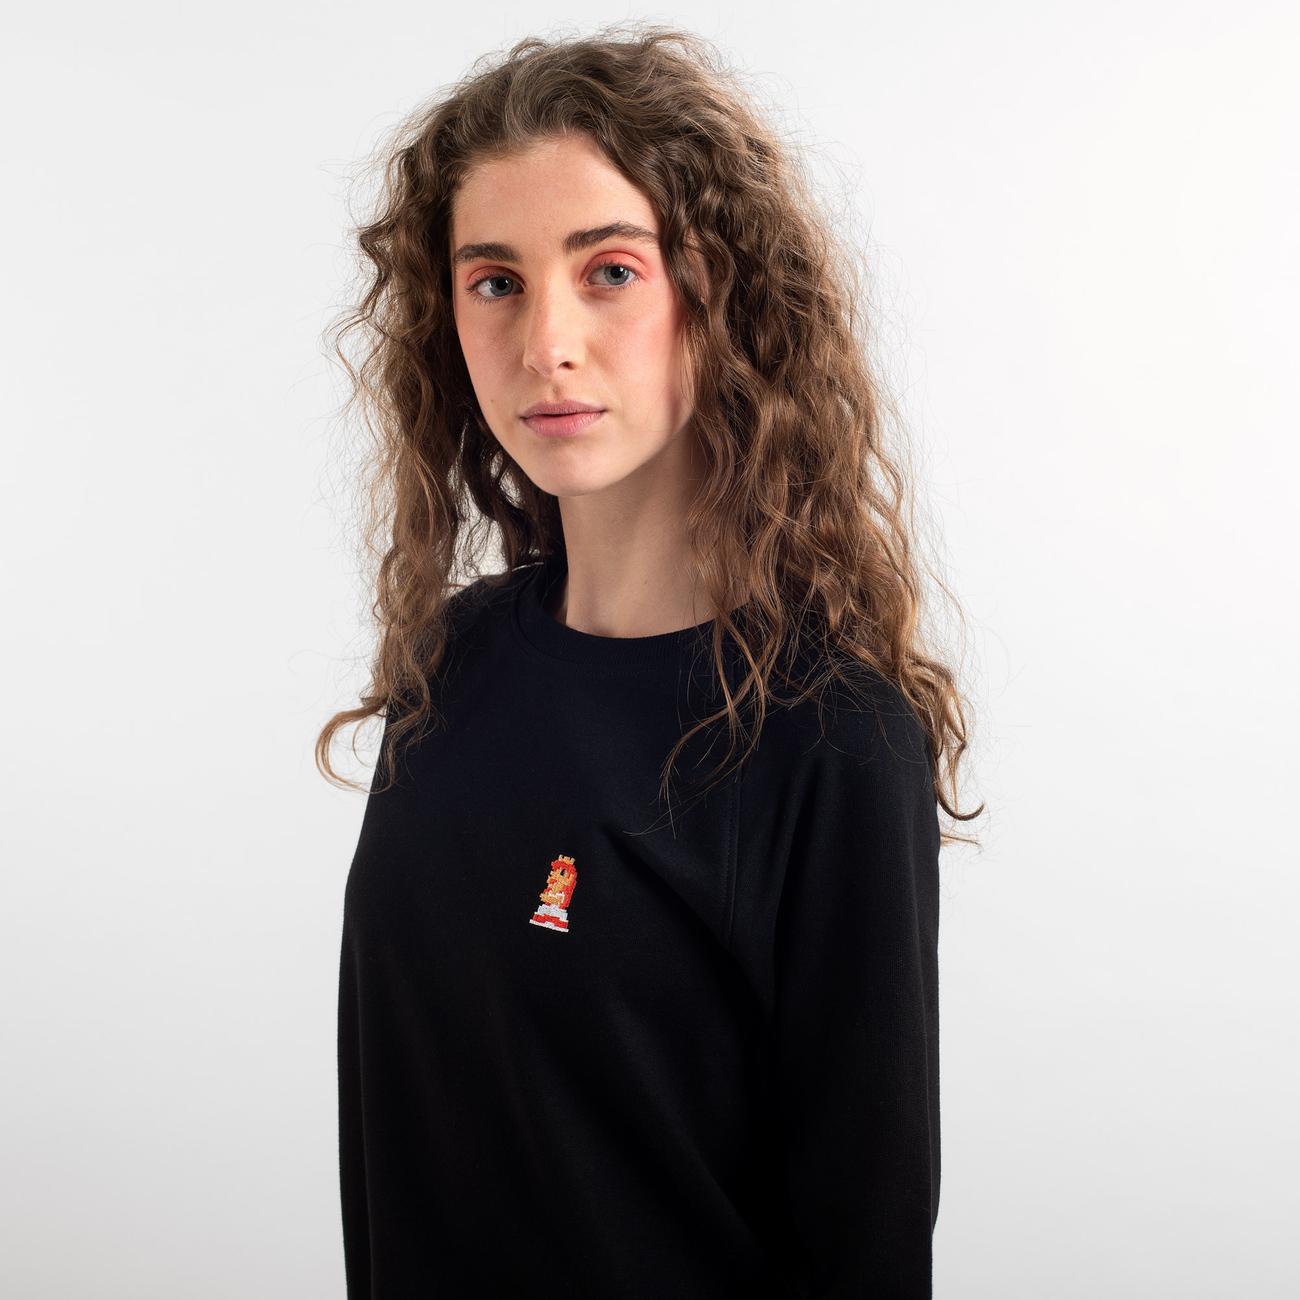 Sweatshirt Ystad Raglan Peach